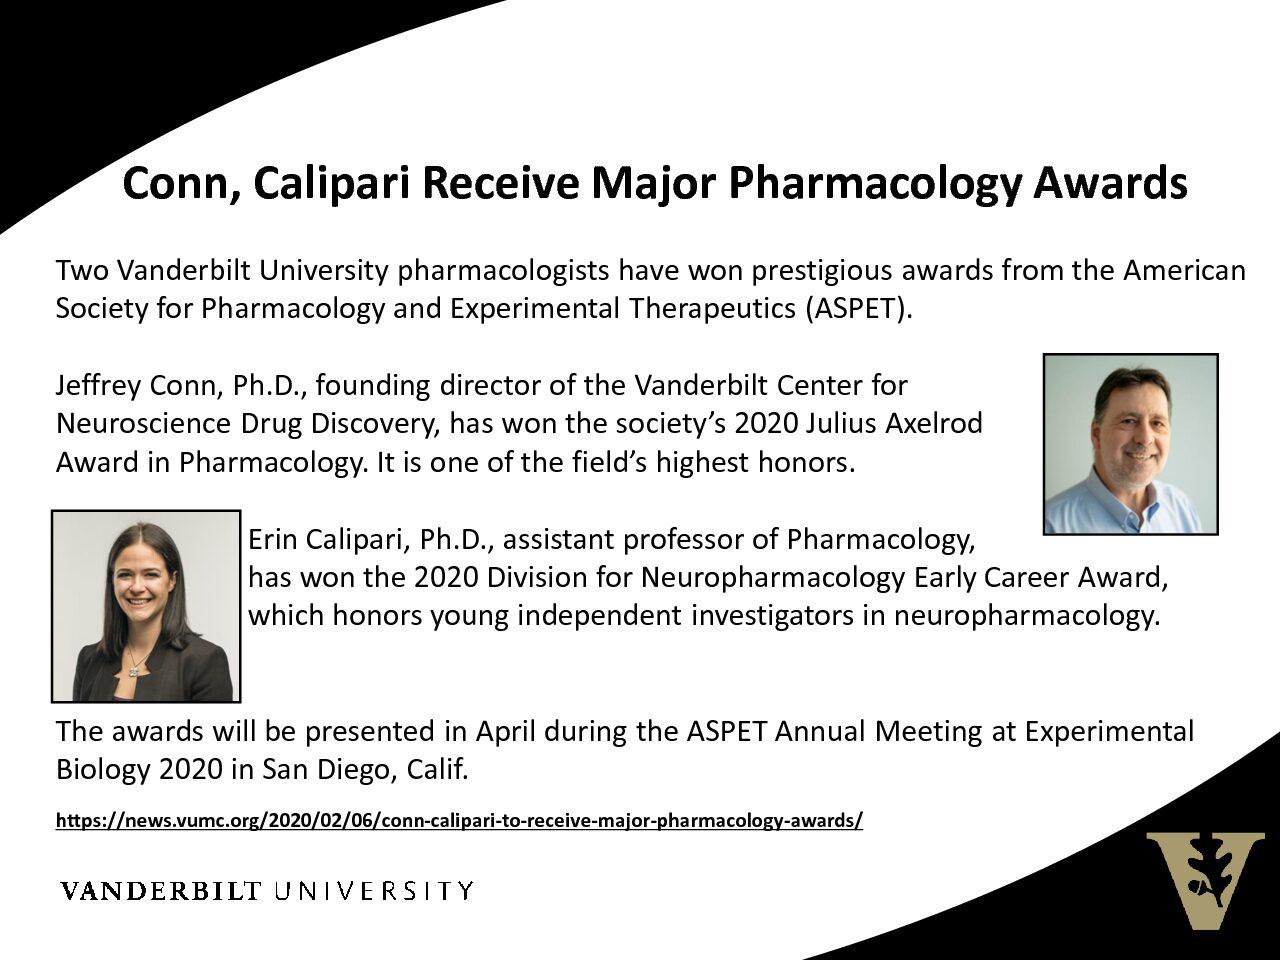 Conn/Calipari Pharmacology Awards